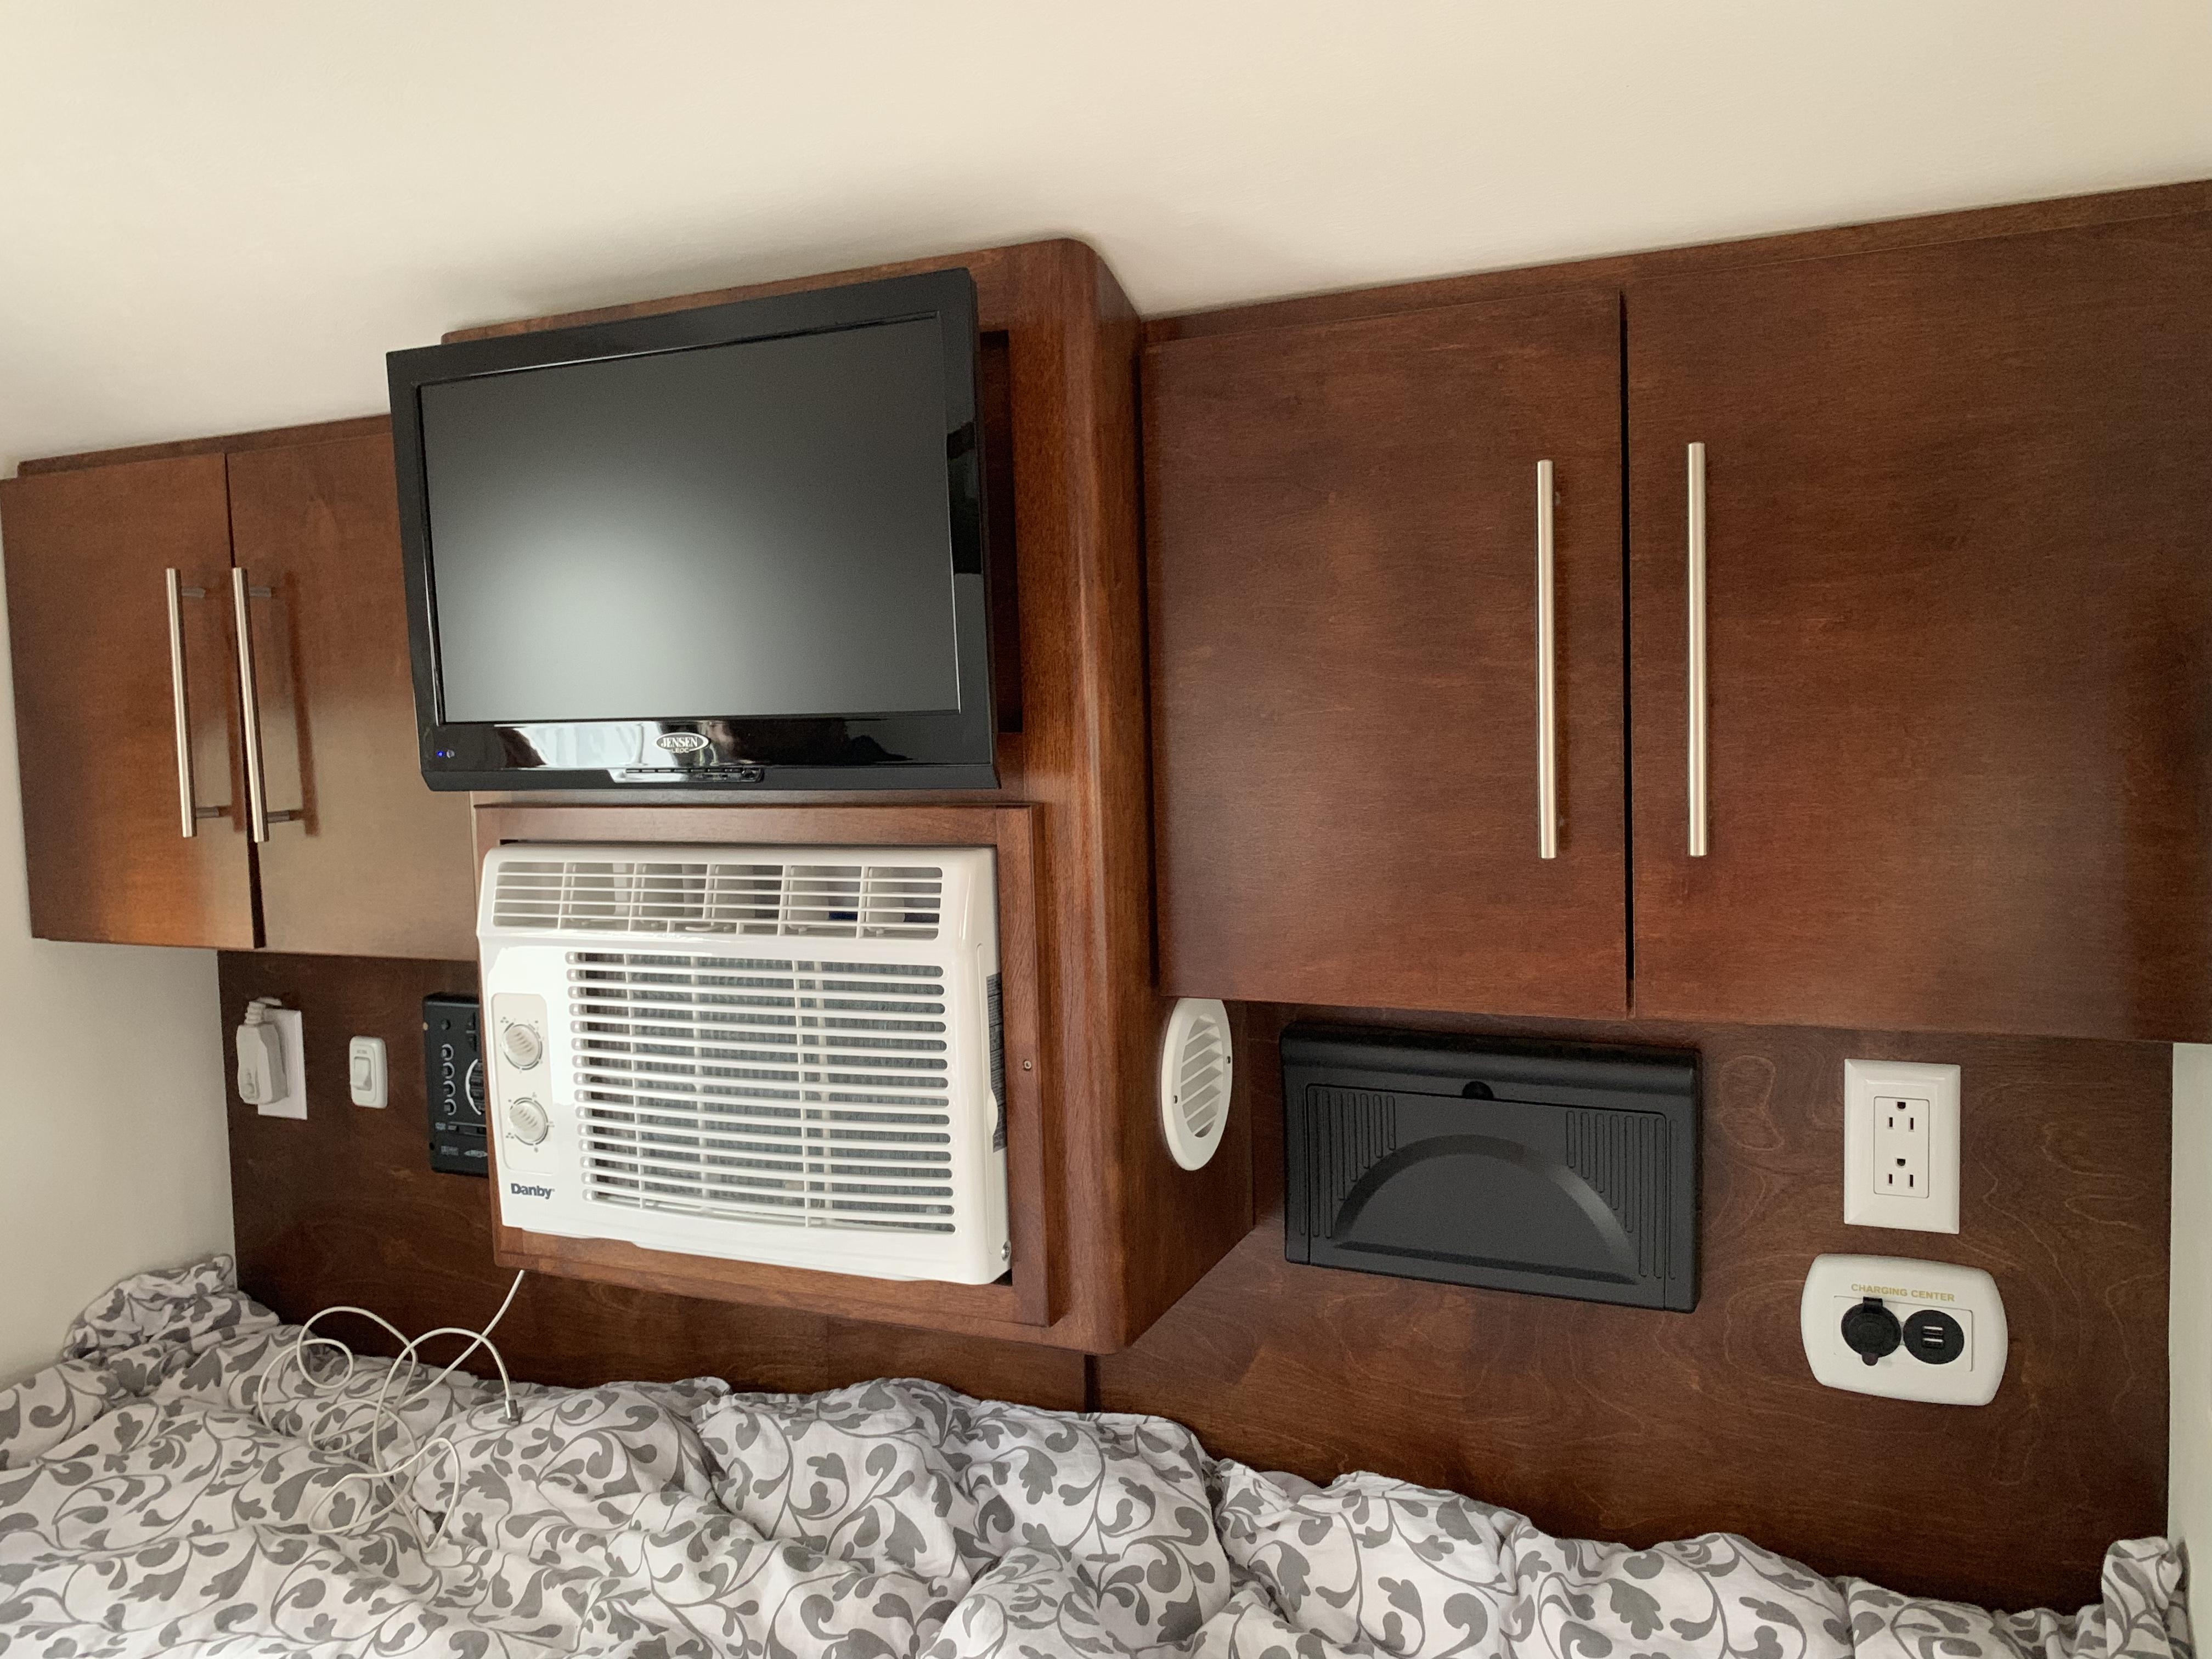 Inside relaxing Watch TV, crank up the AC. Little Guy Sport 6 Wide 2017